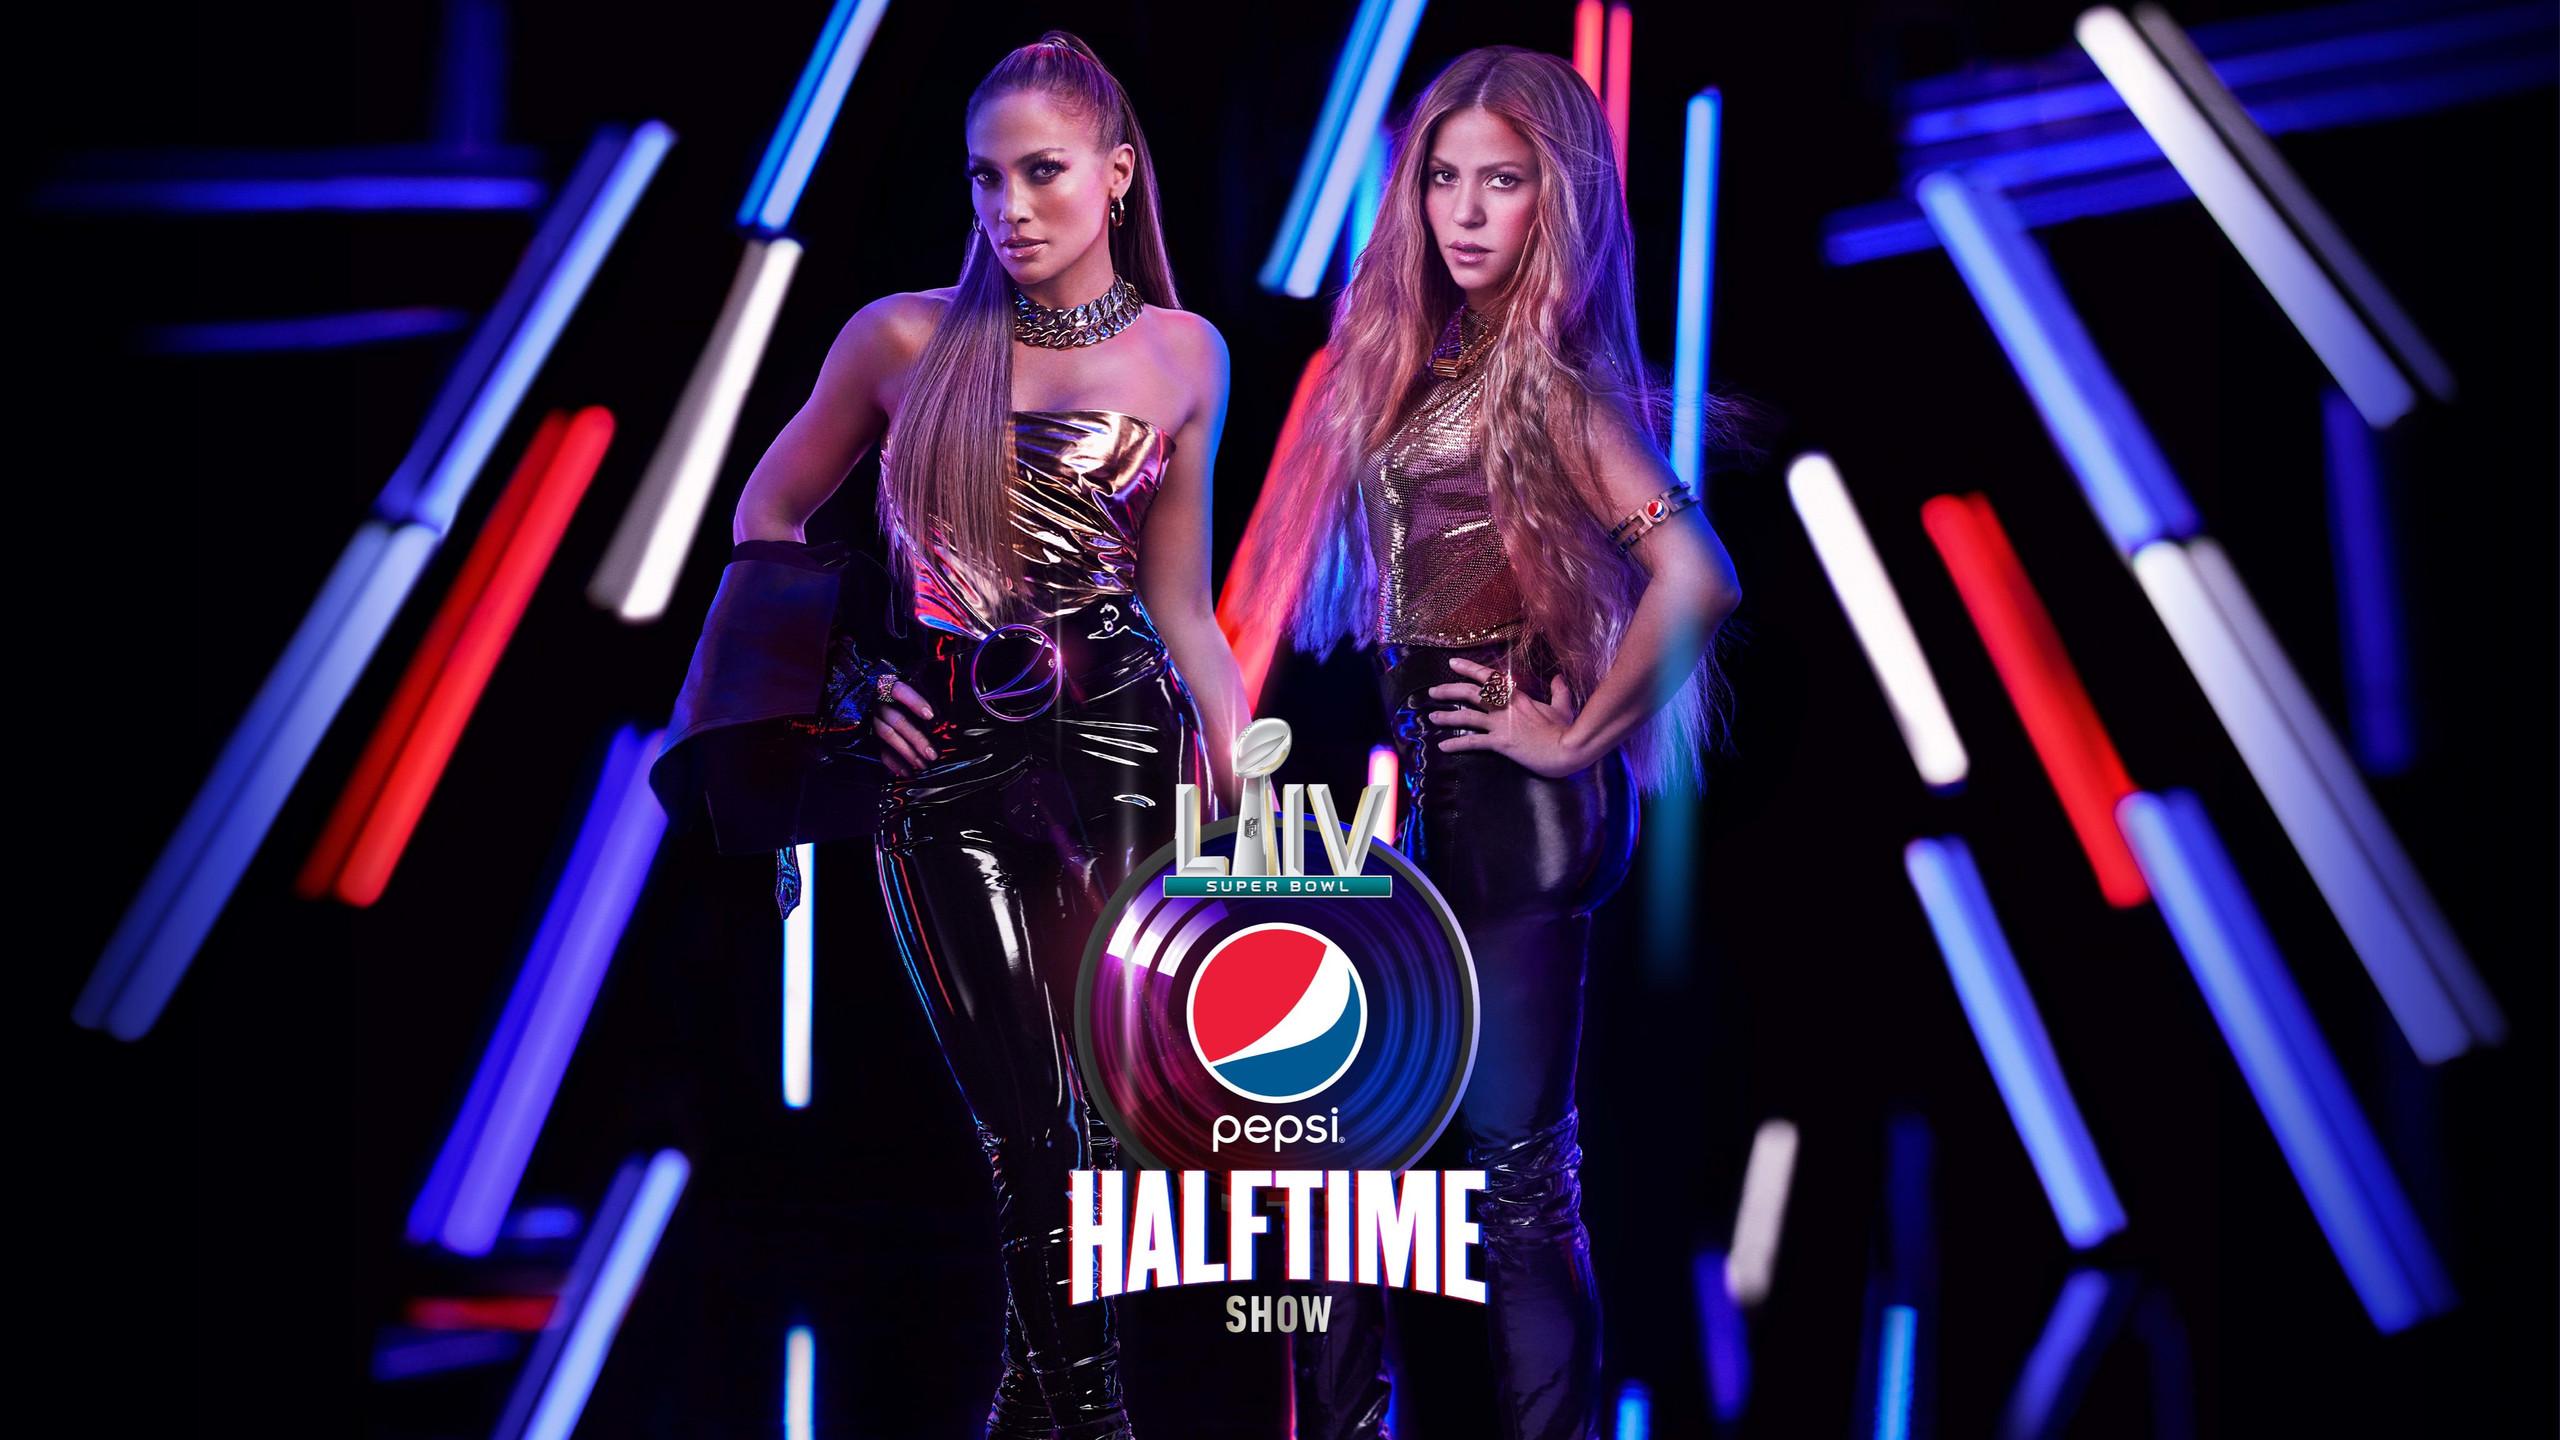 Jennifer Lopez y Shakira las próximas artistas del medio tiempo de la super bowl